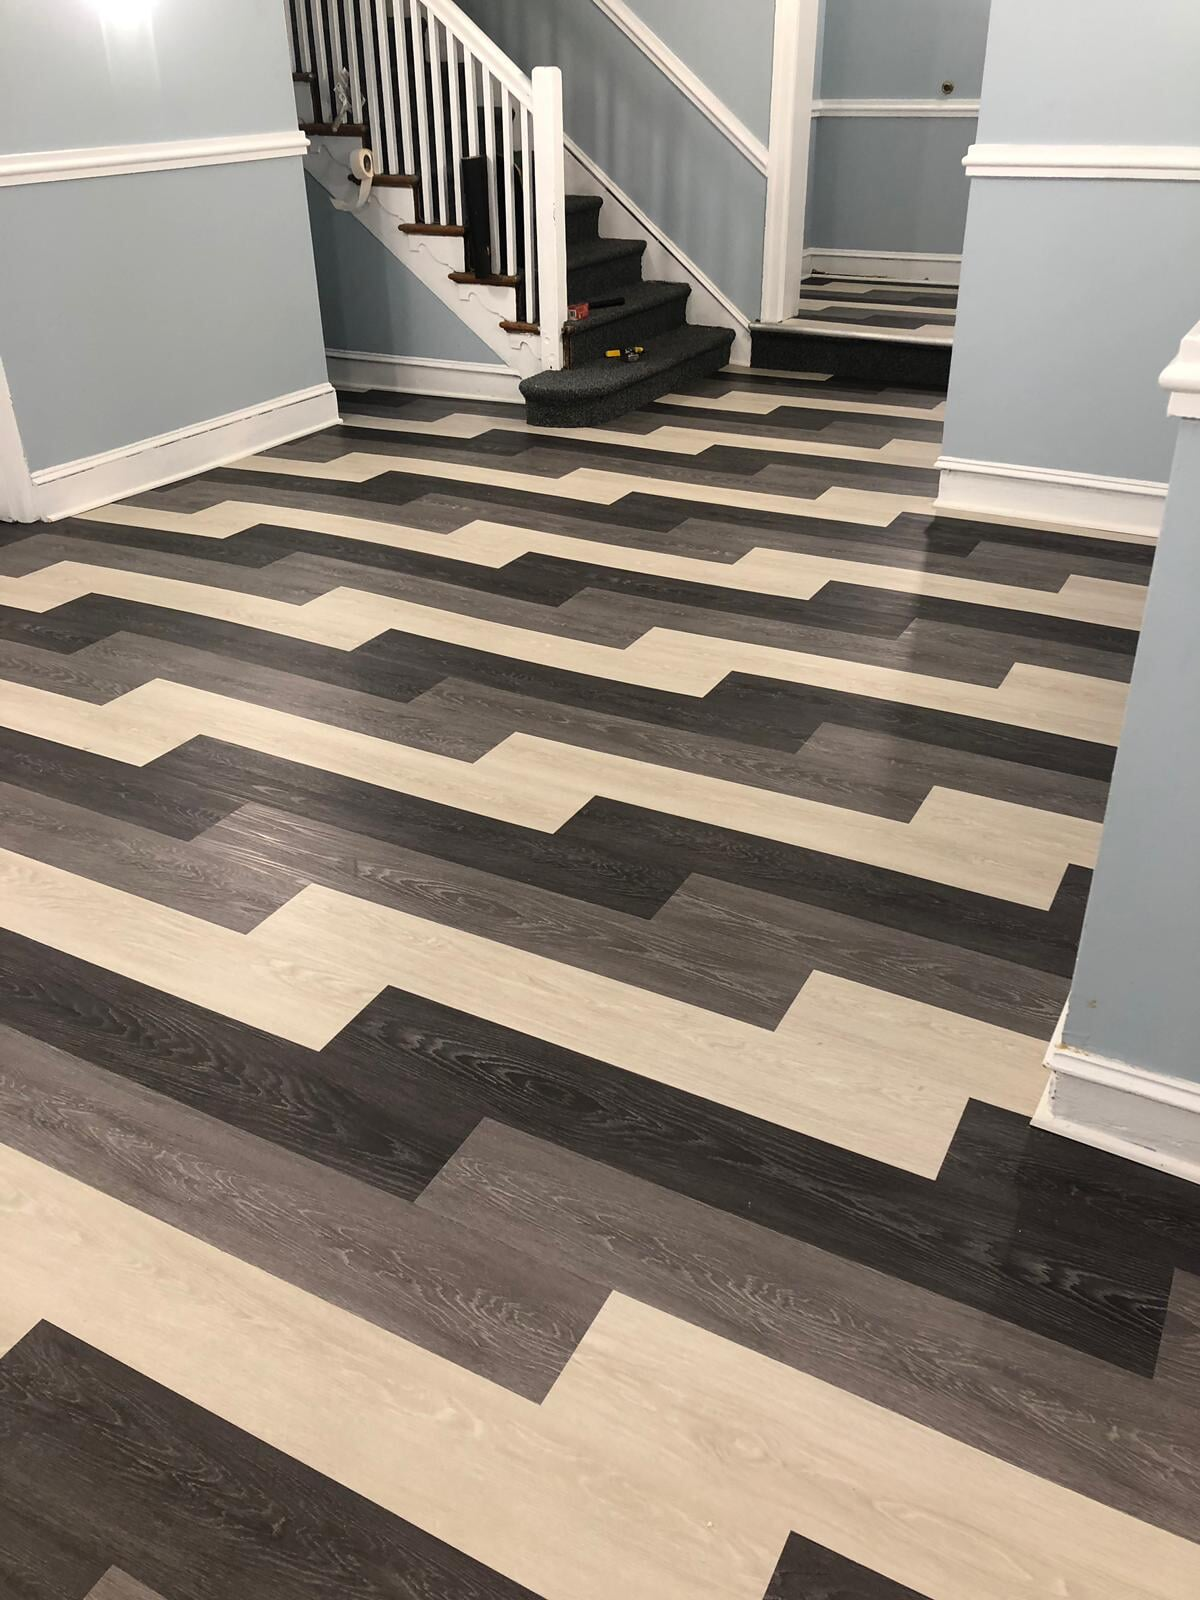 Multi-color flooring in North Philadelphia, PA from Philadelphia Flooring Solutions